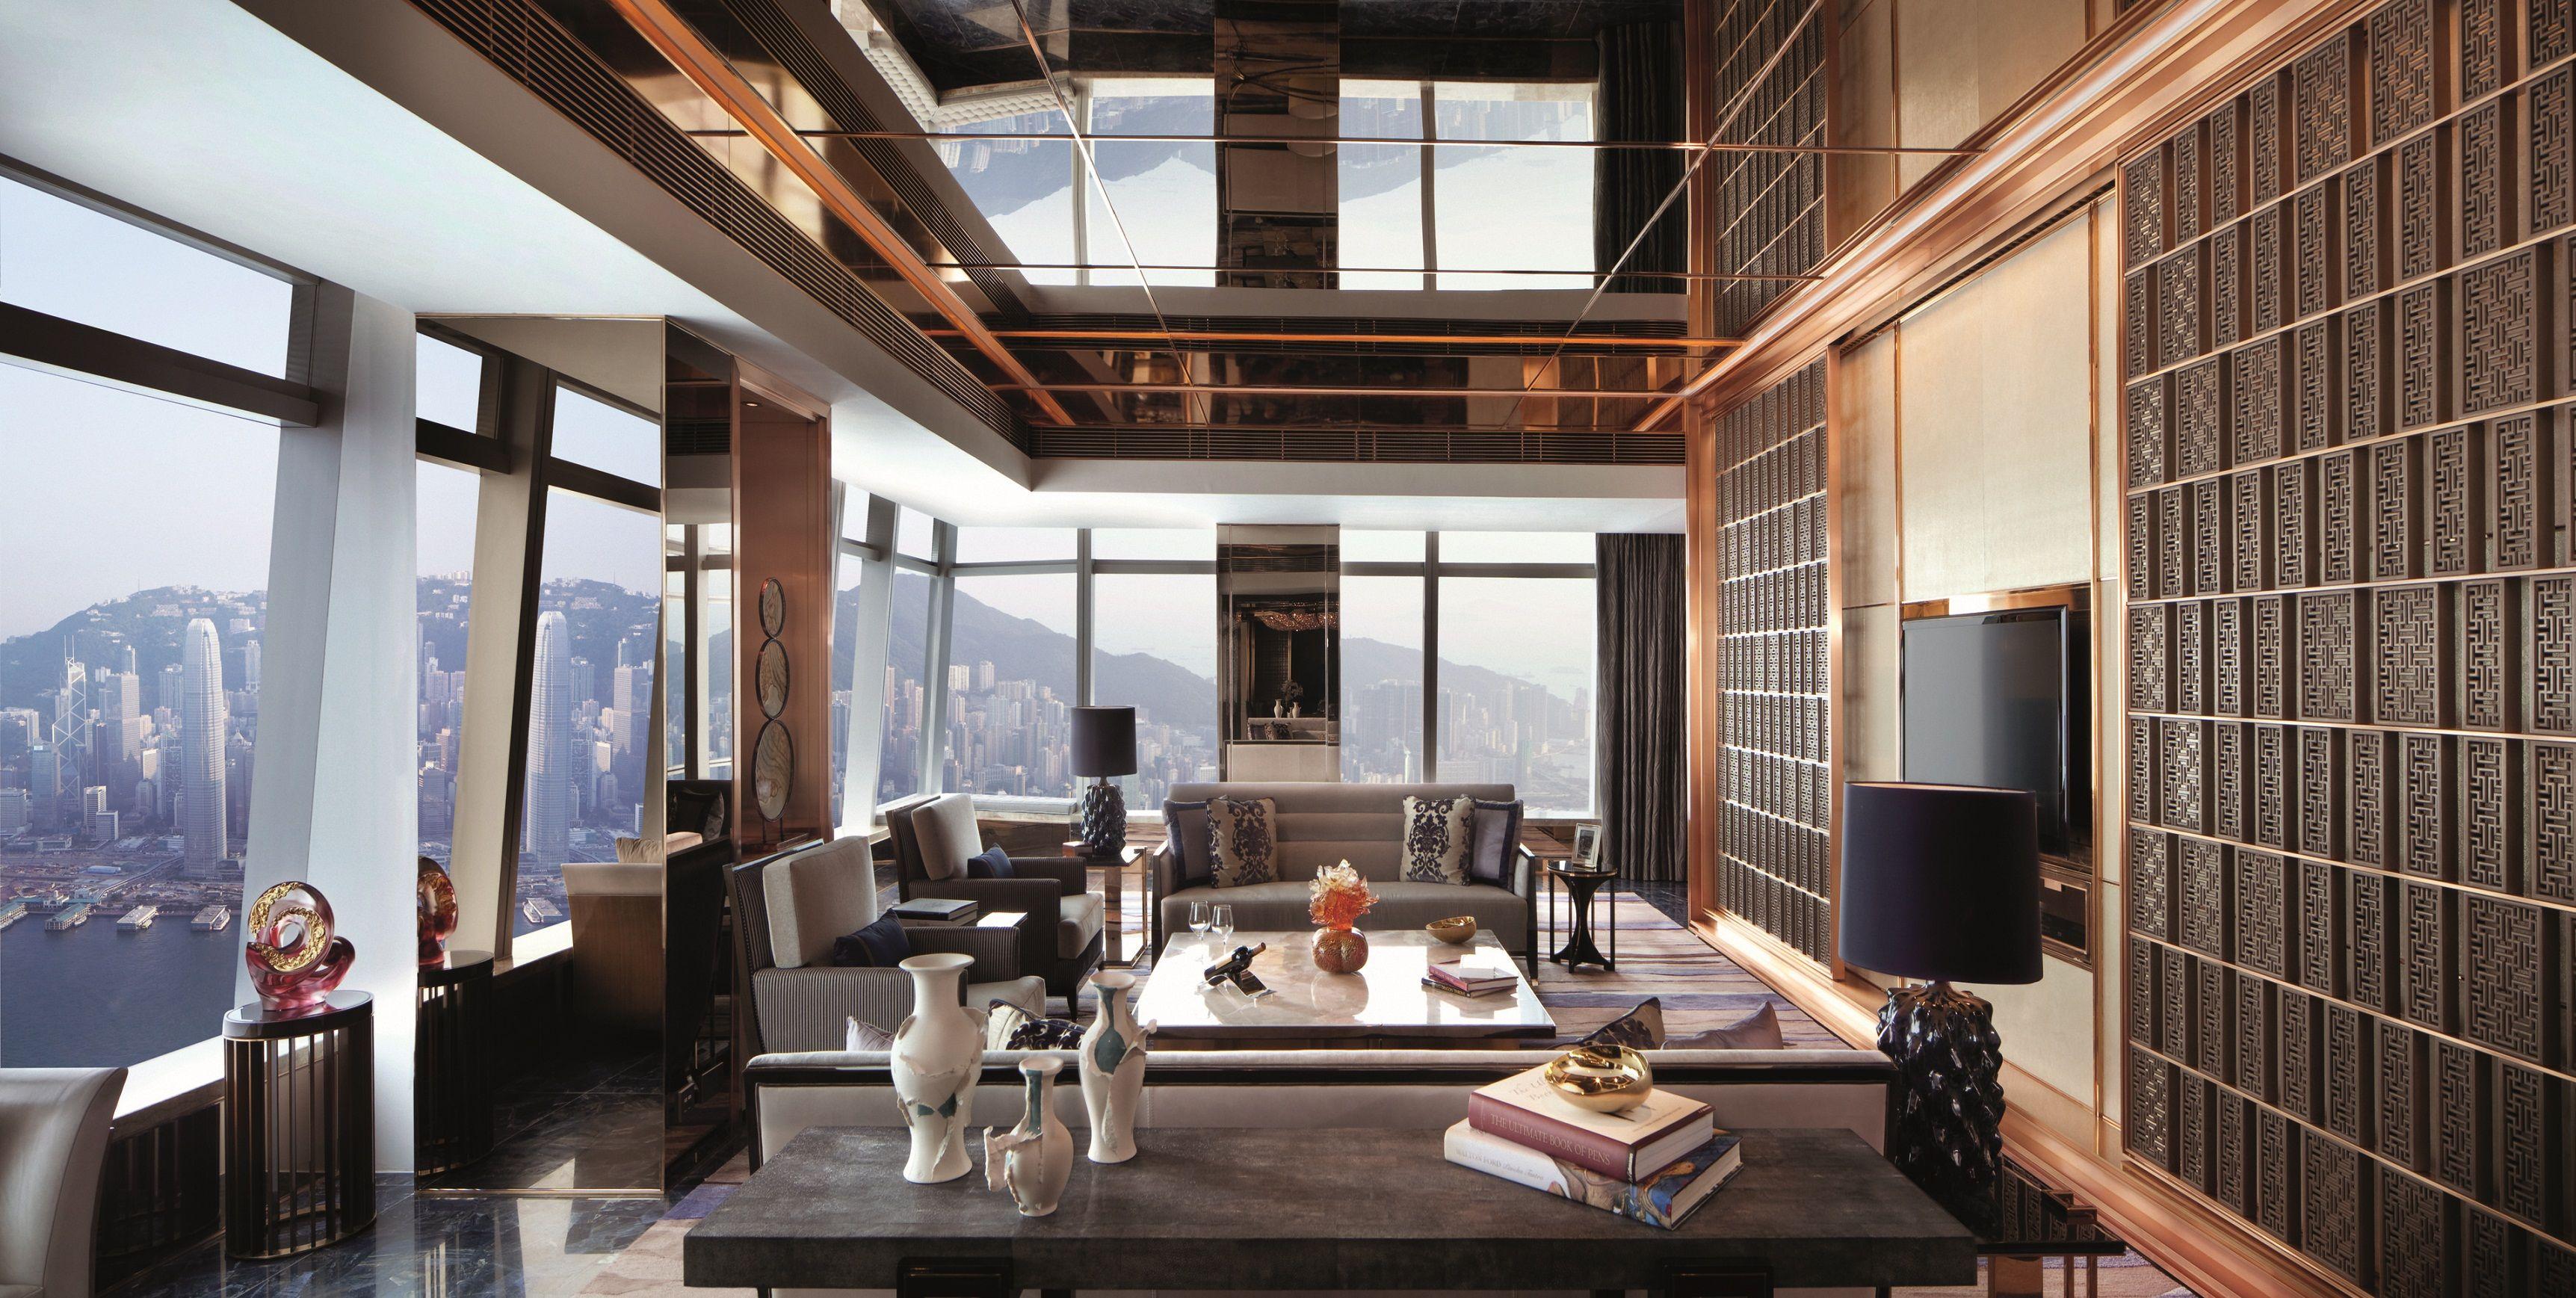 The Ritz Carlton Hong Kong Suites feature dramatic